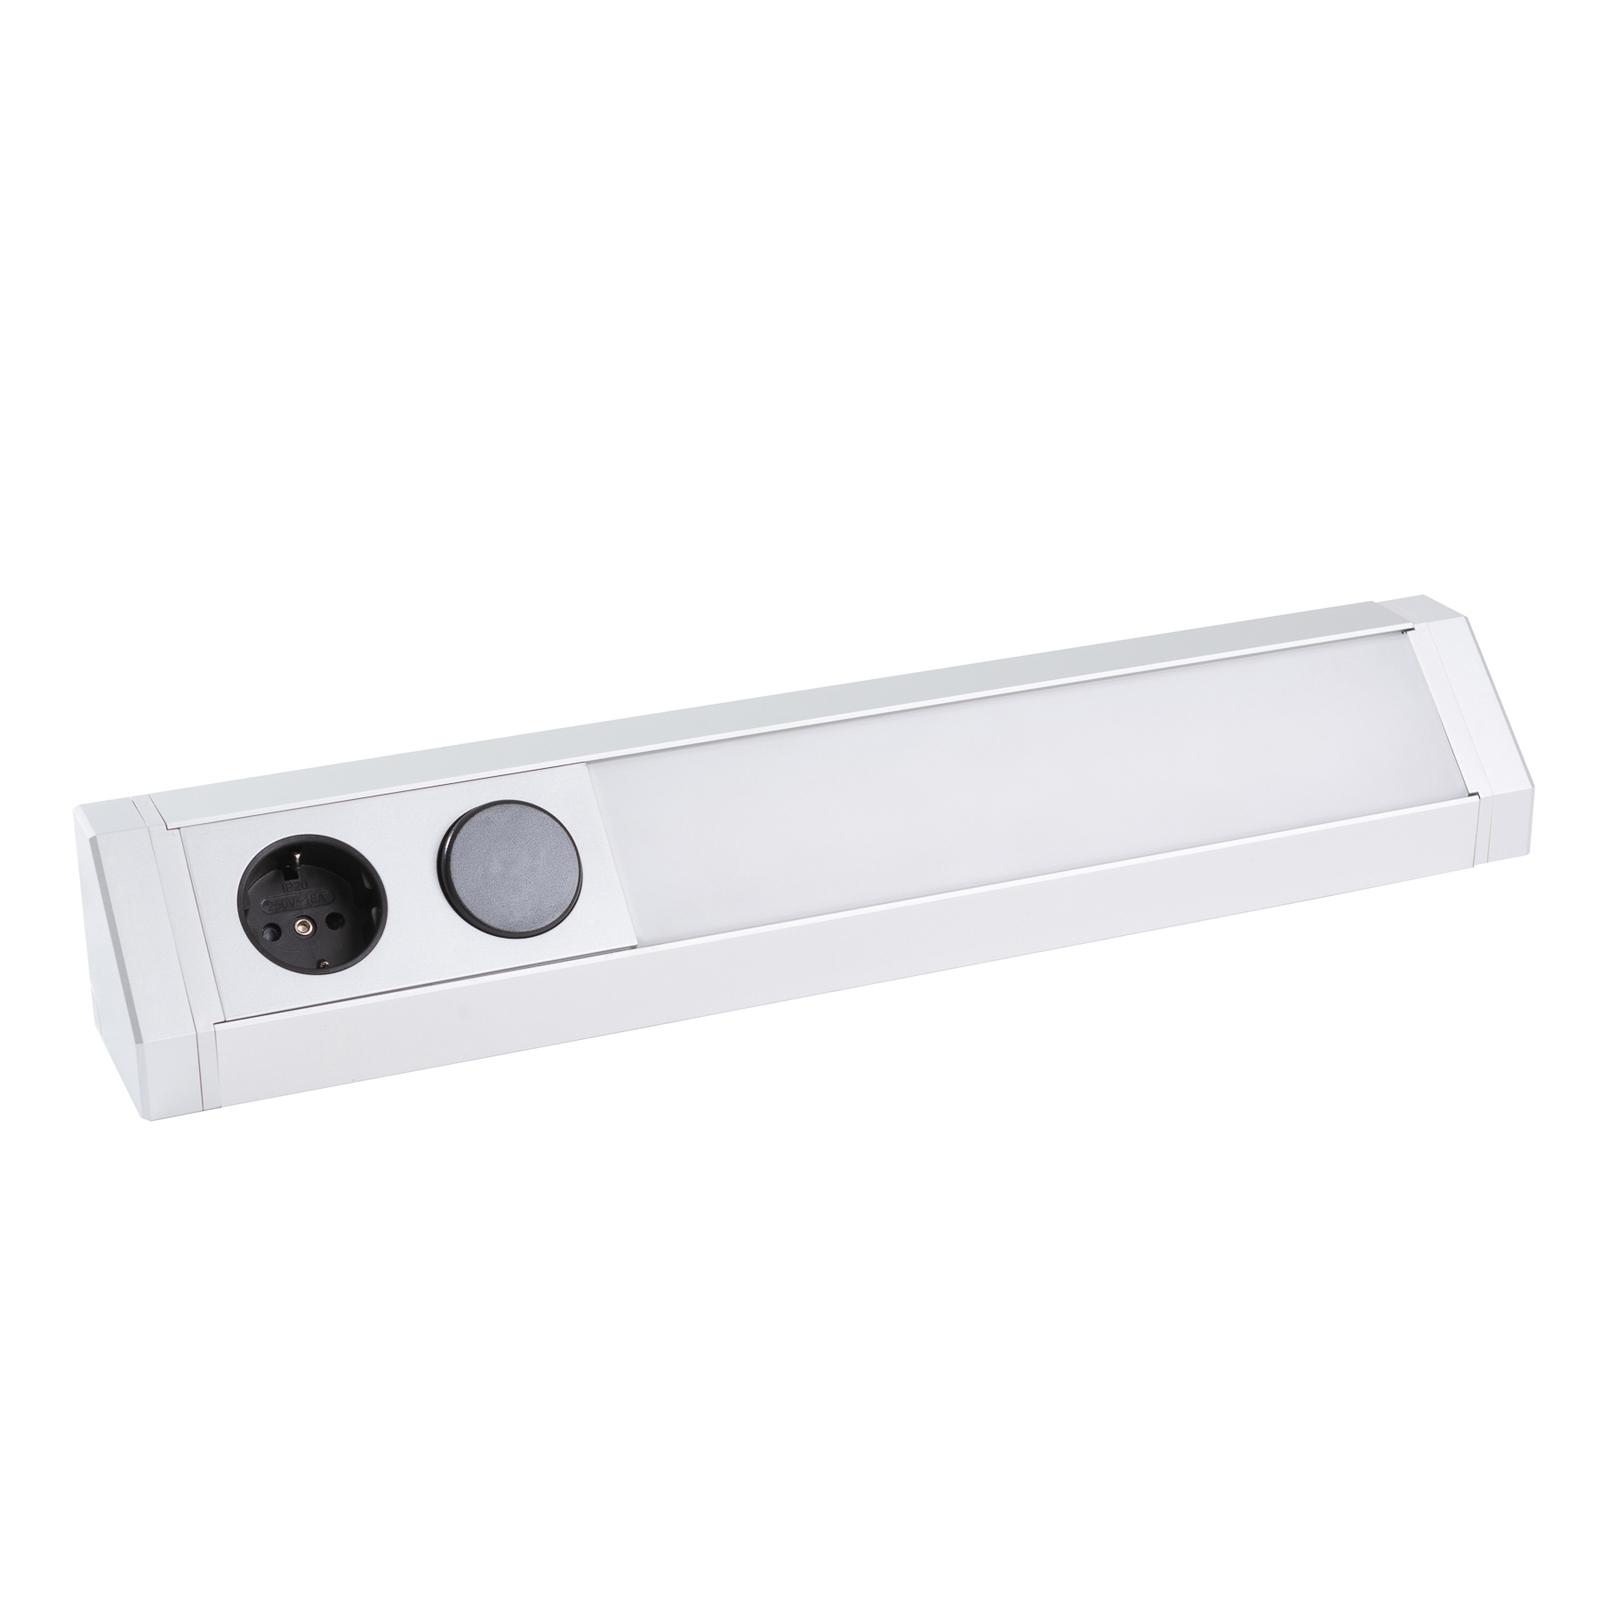 Arcchio Mitari LED-underskabsbelysning, sølv